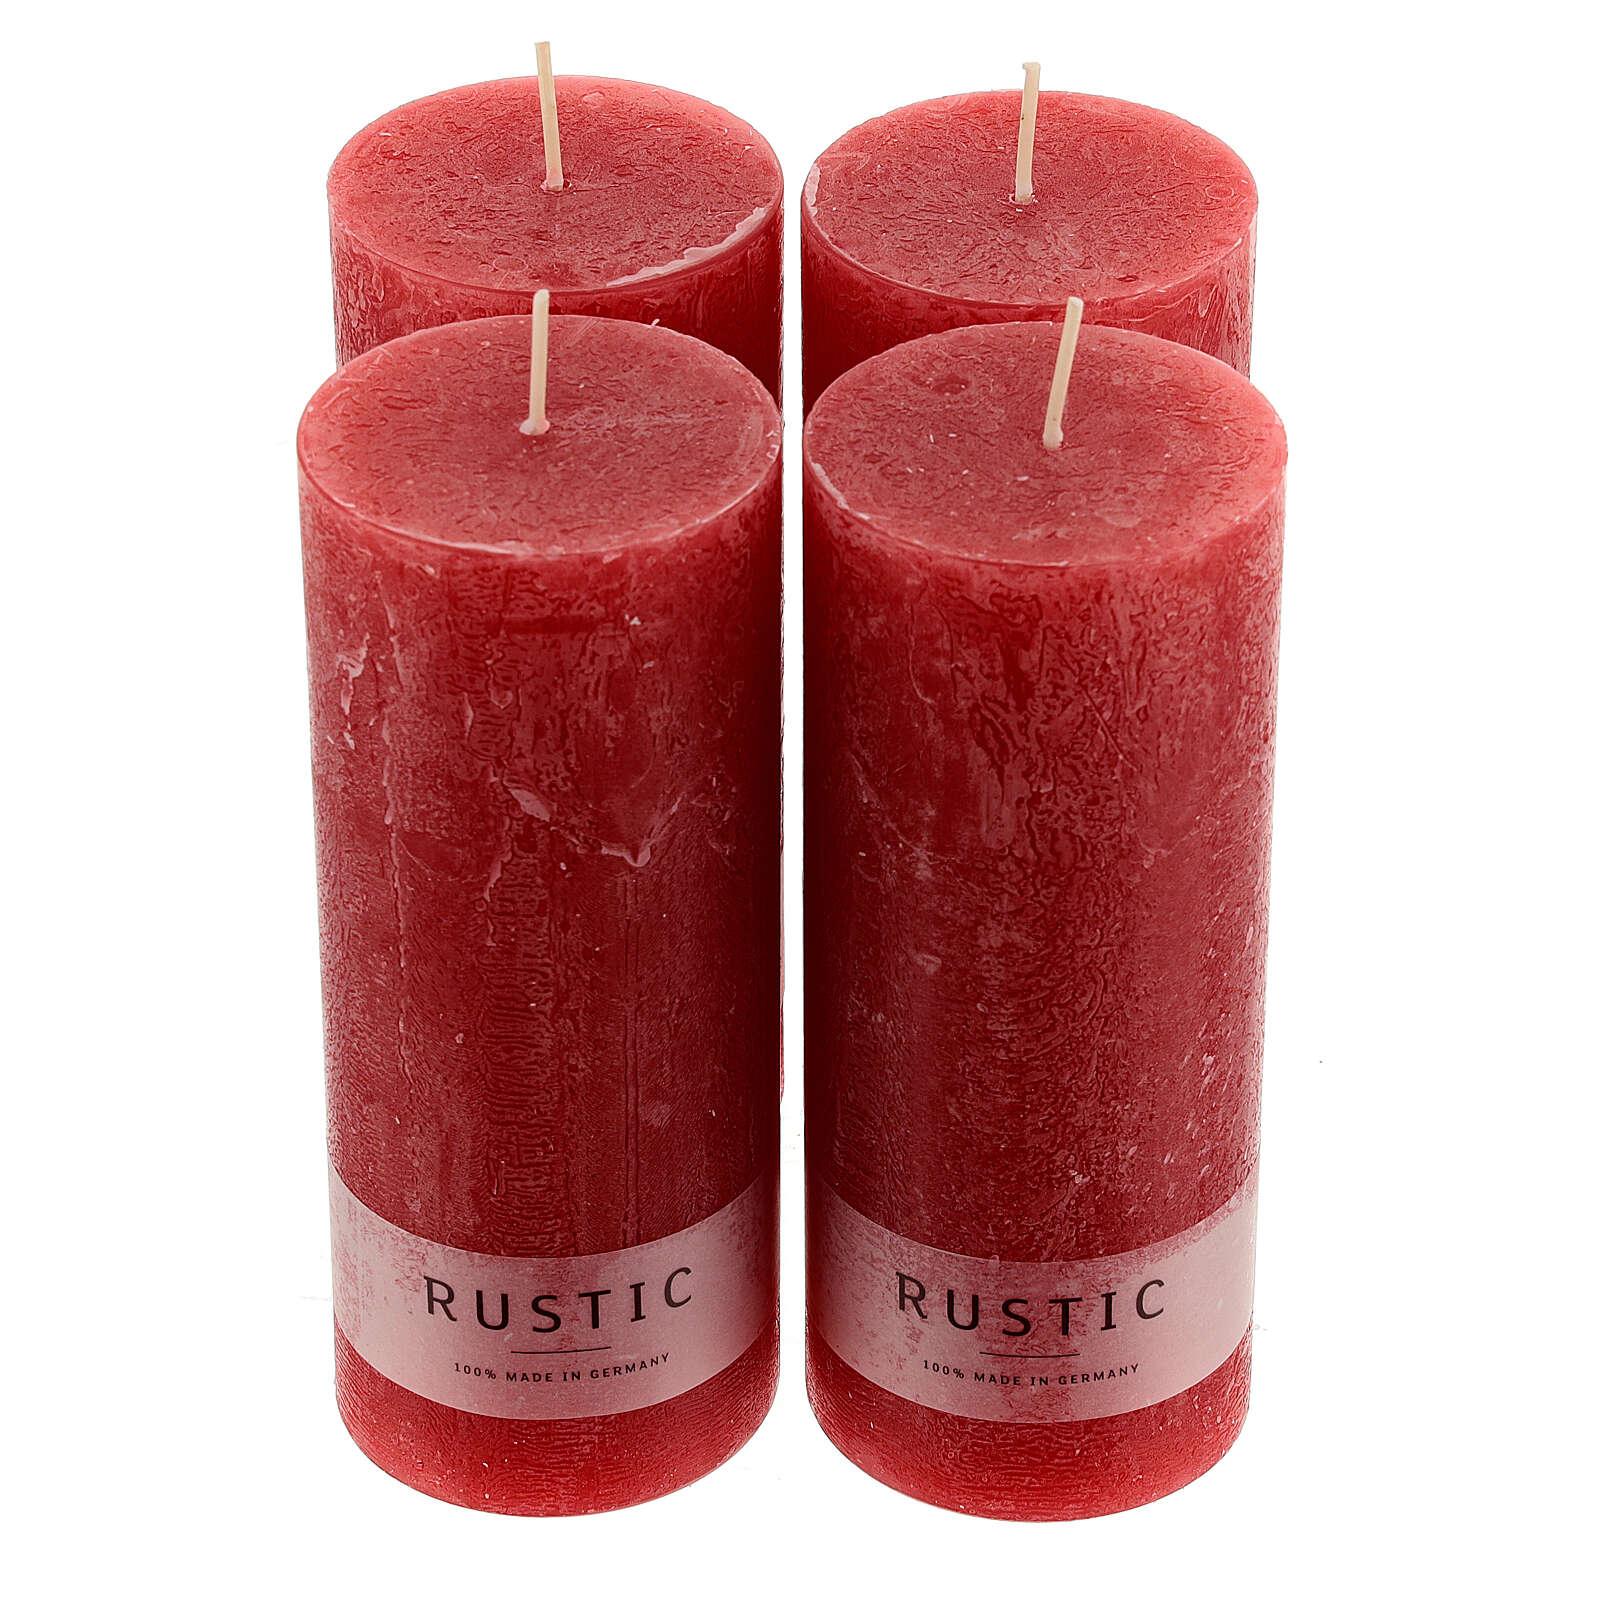 Kerzen rustikaler Stil 4 Stück rot, 170x70 mm 3